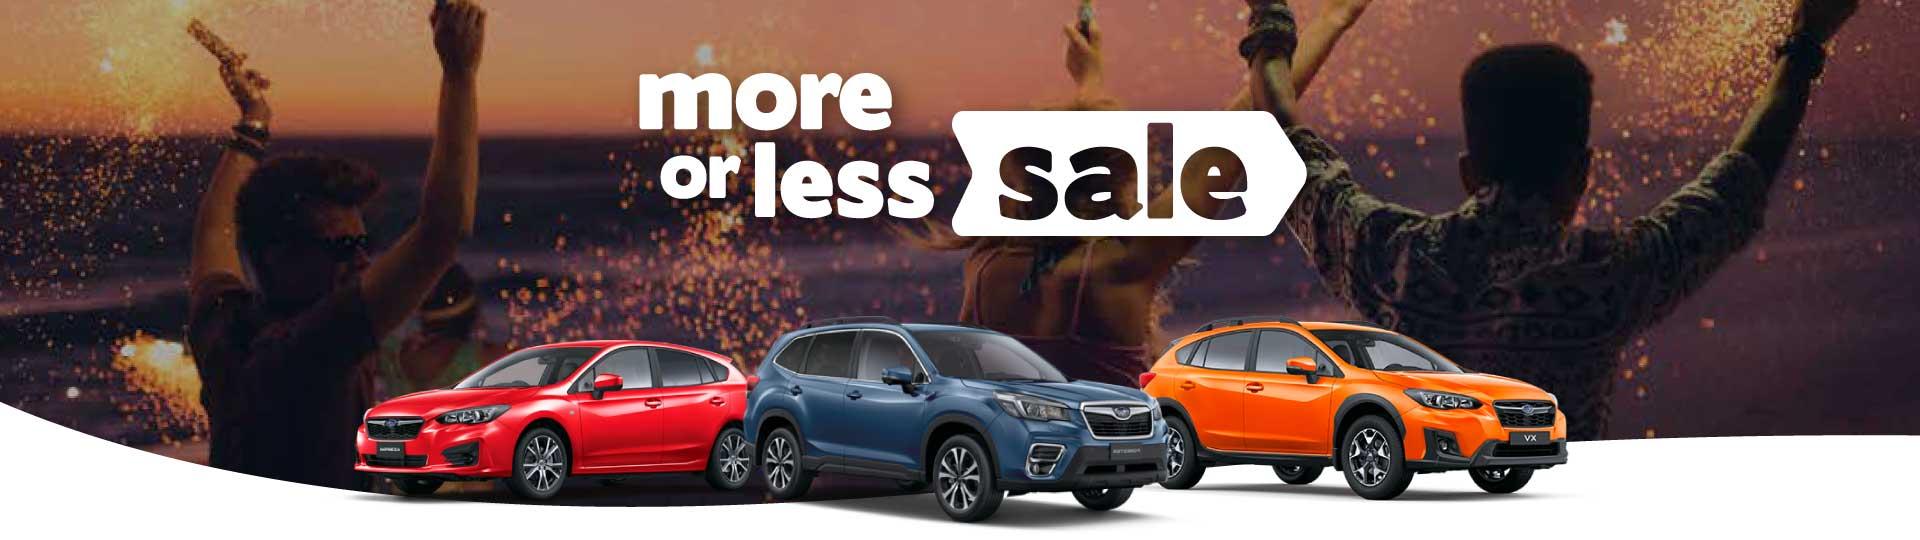 Cricks More or Less Sale